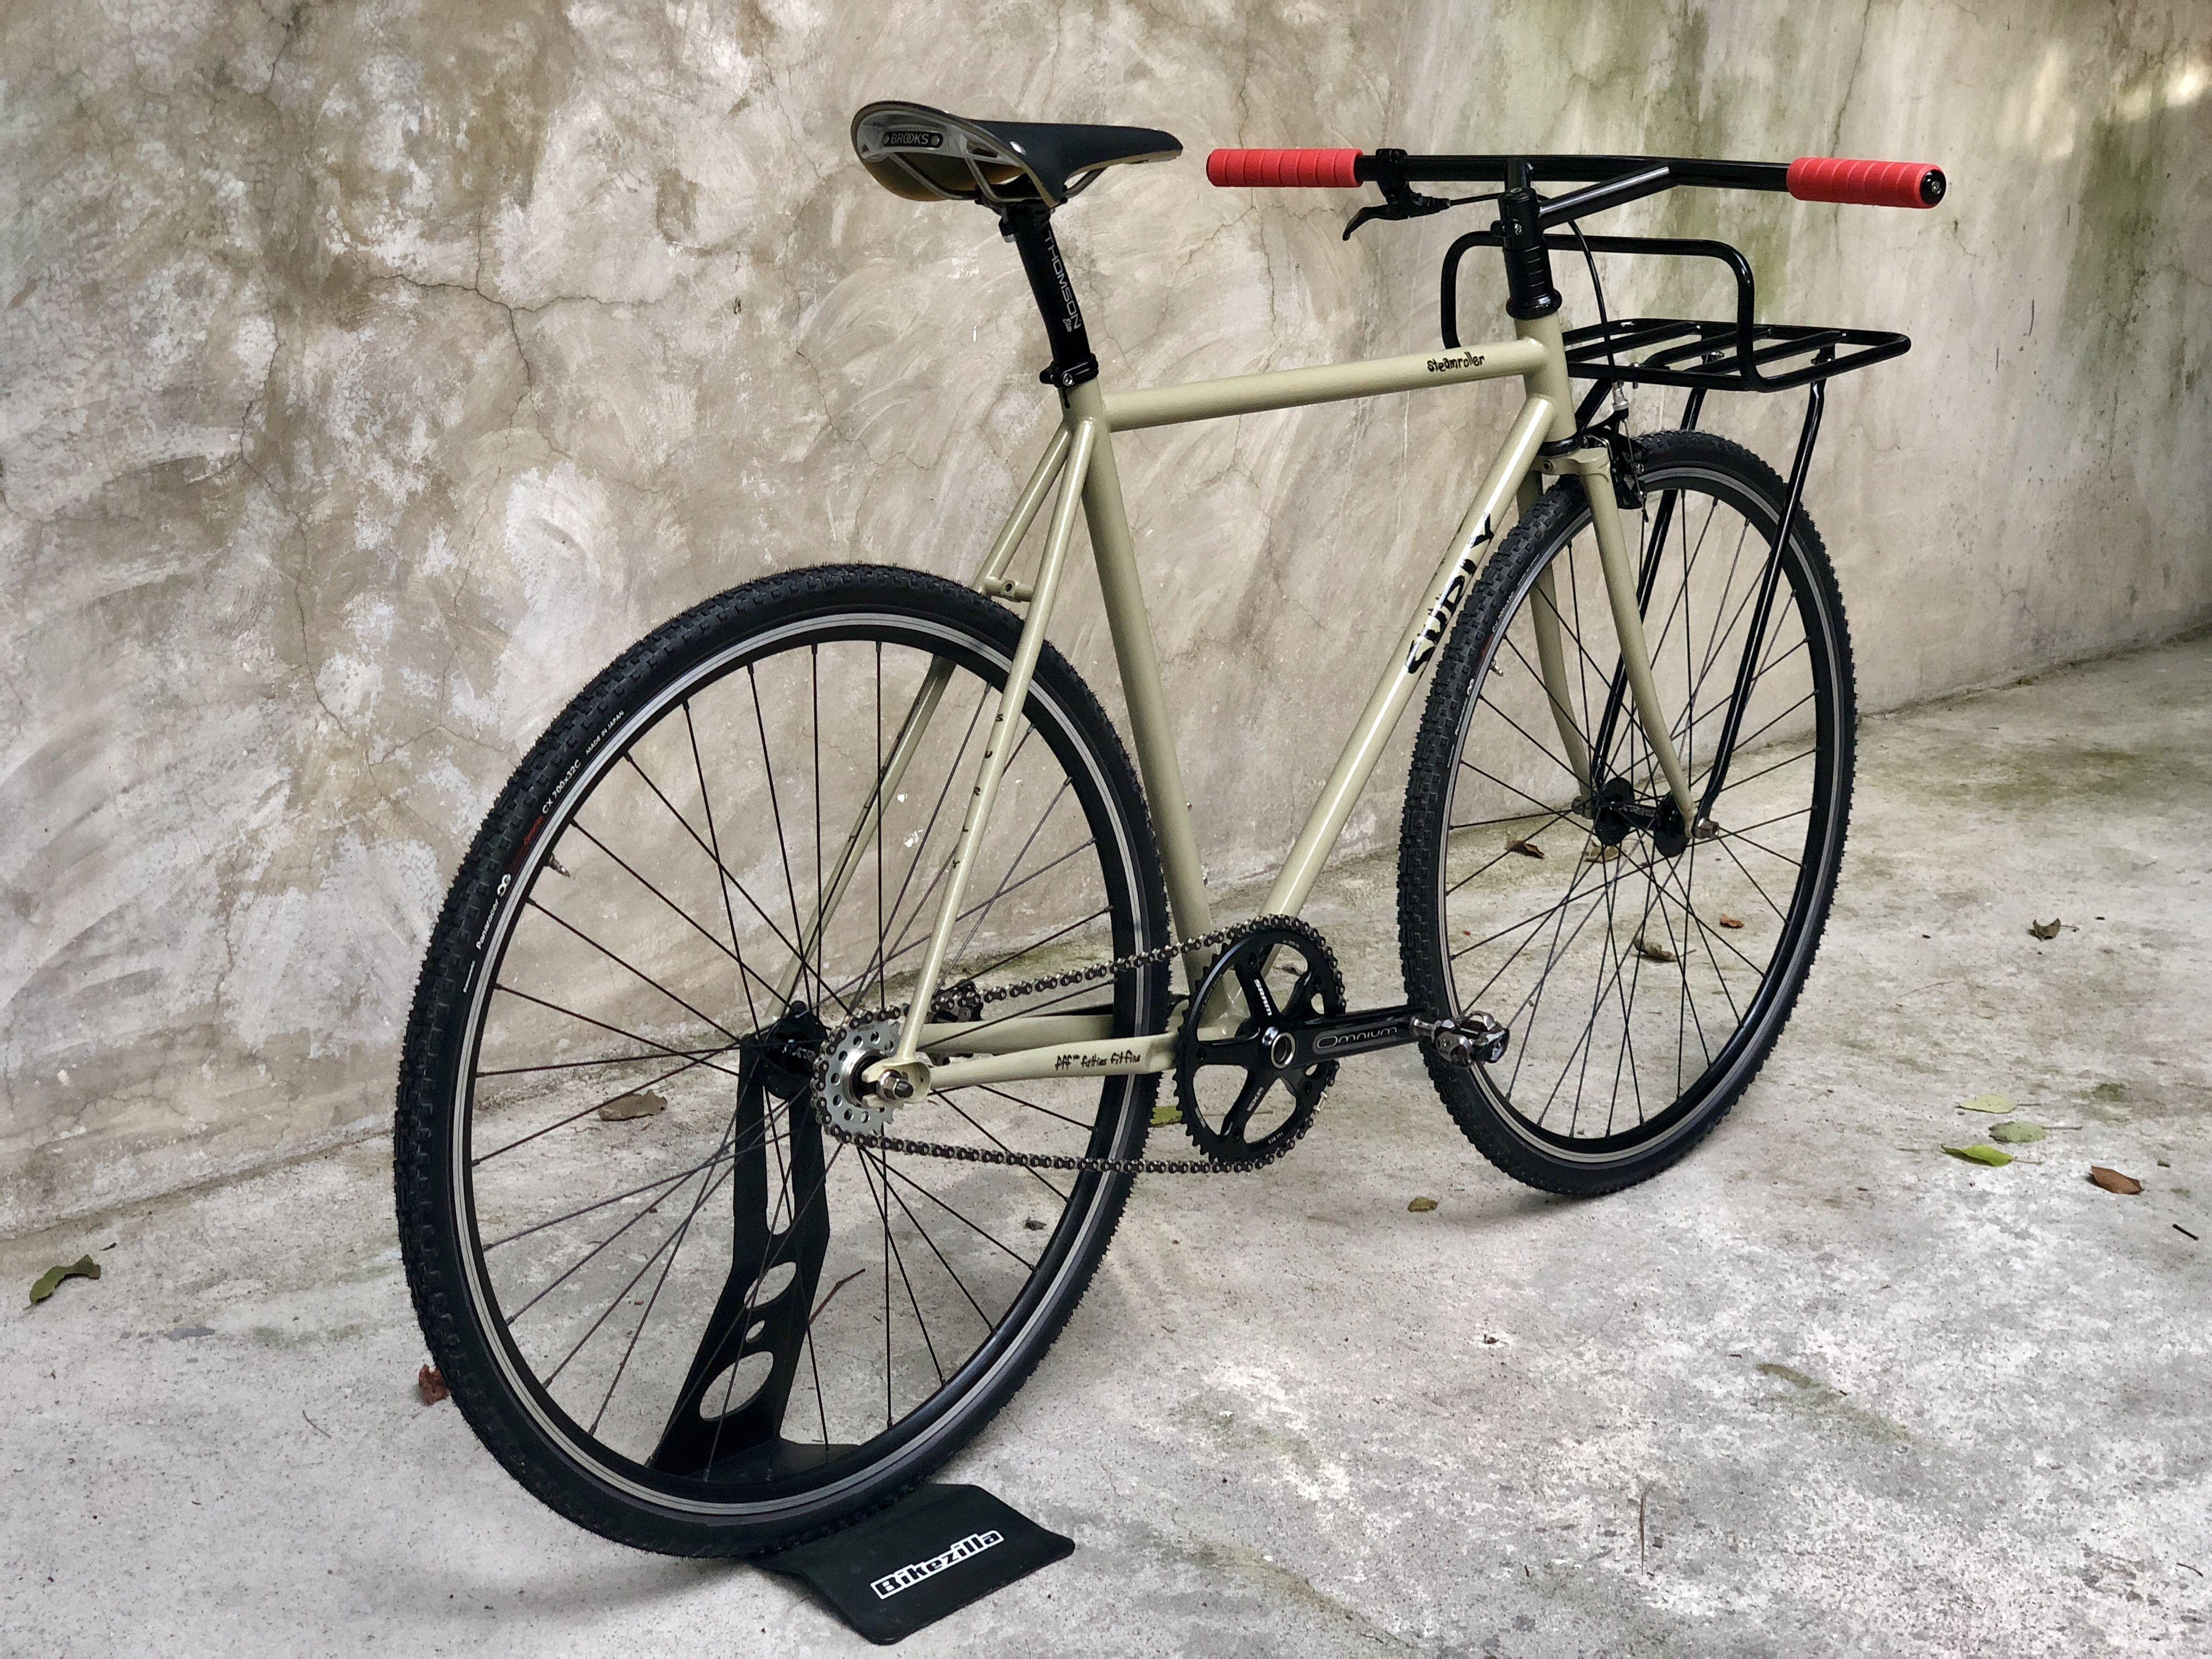 Pin By Joseph Martin On Fixed Gear Bike Accesories Surly Bike